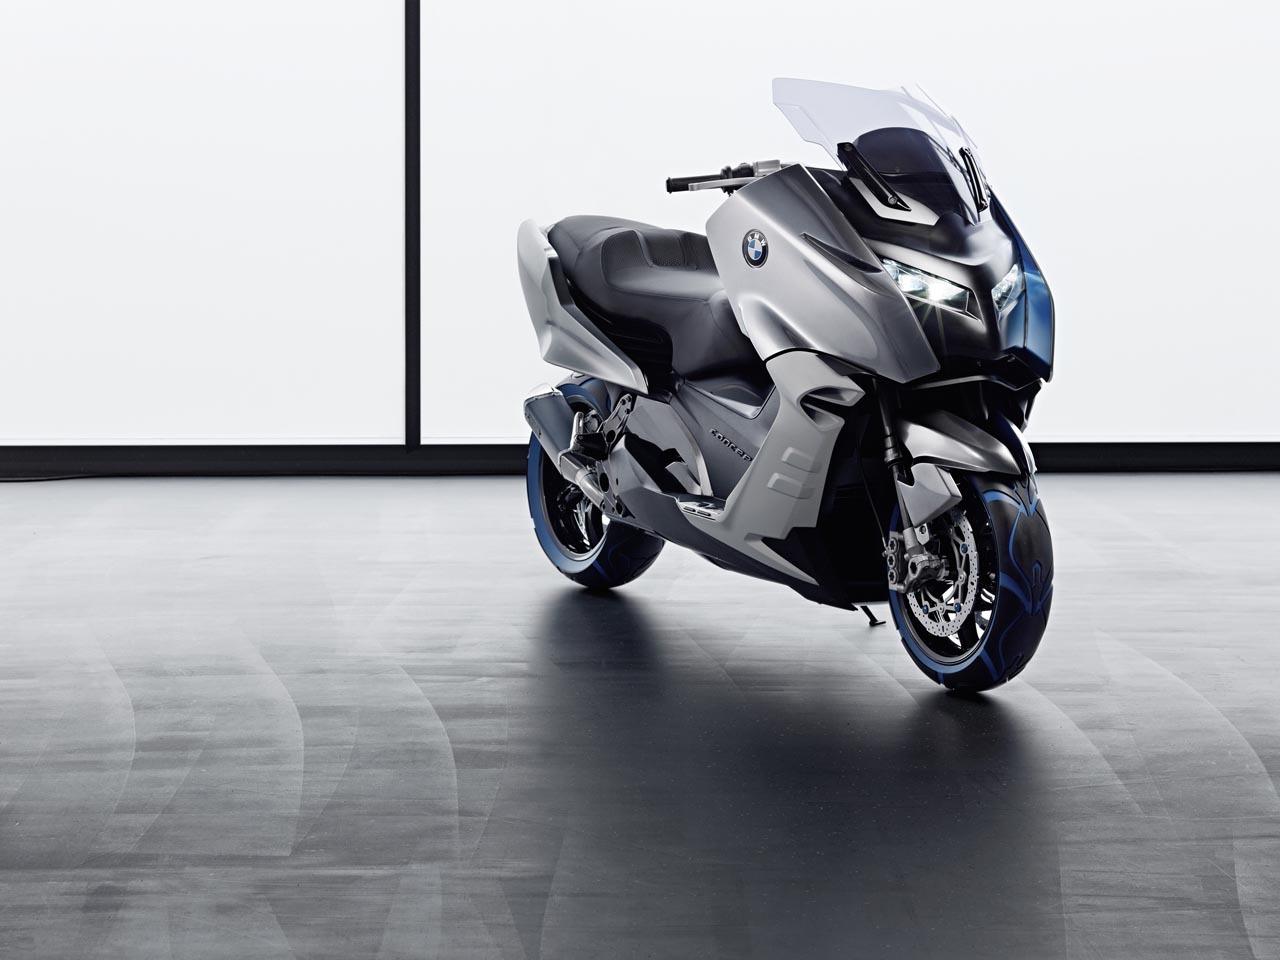 Foto de BMW Concept C Scooter, el Scooter del futuro según BMW (9/19)